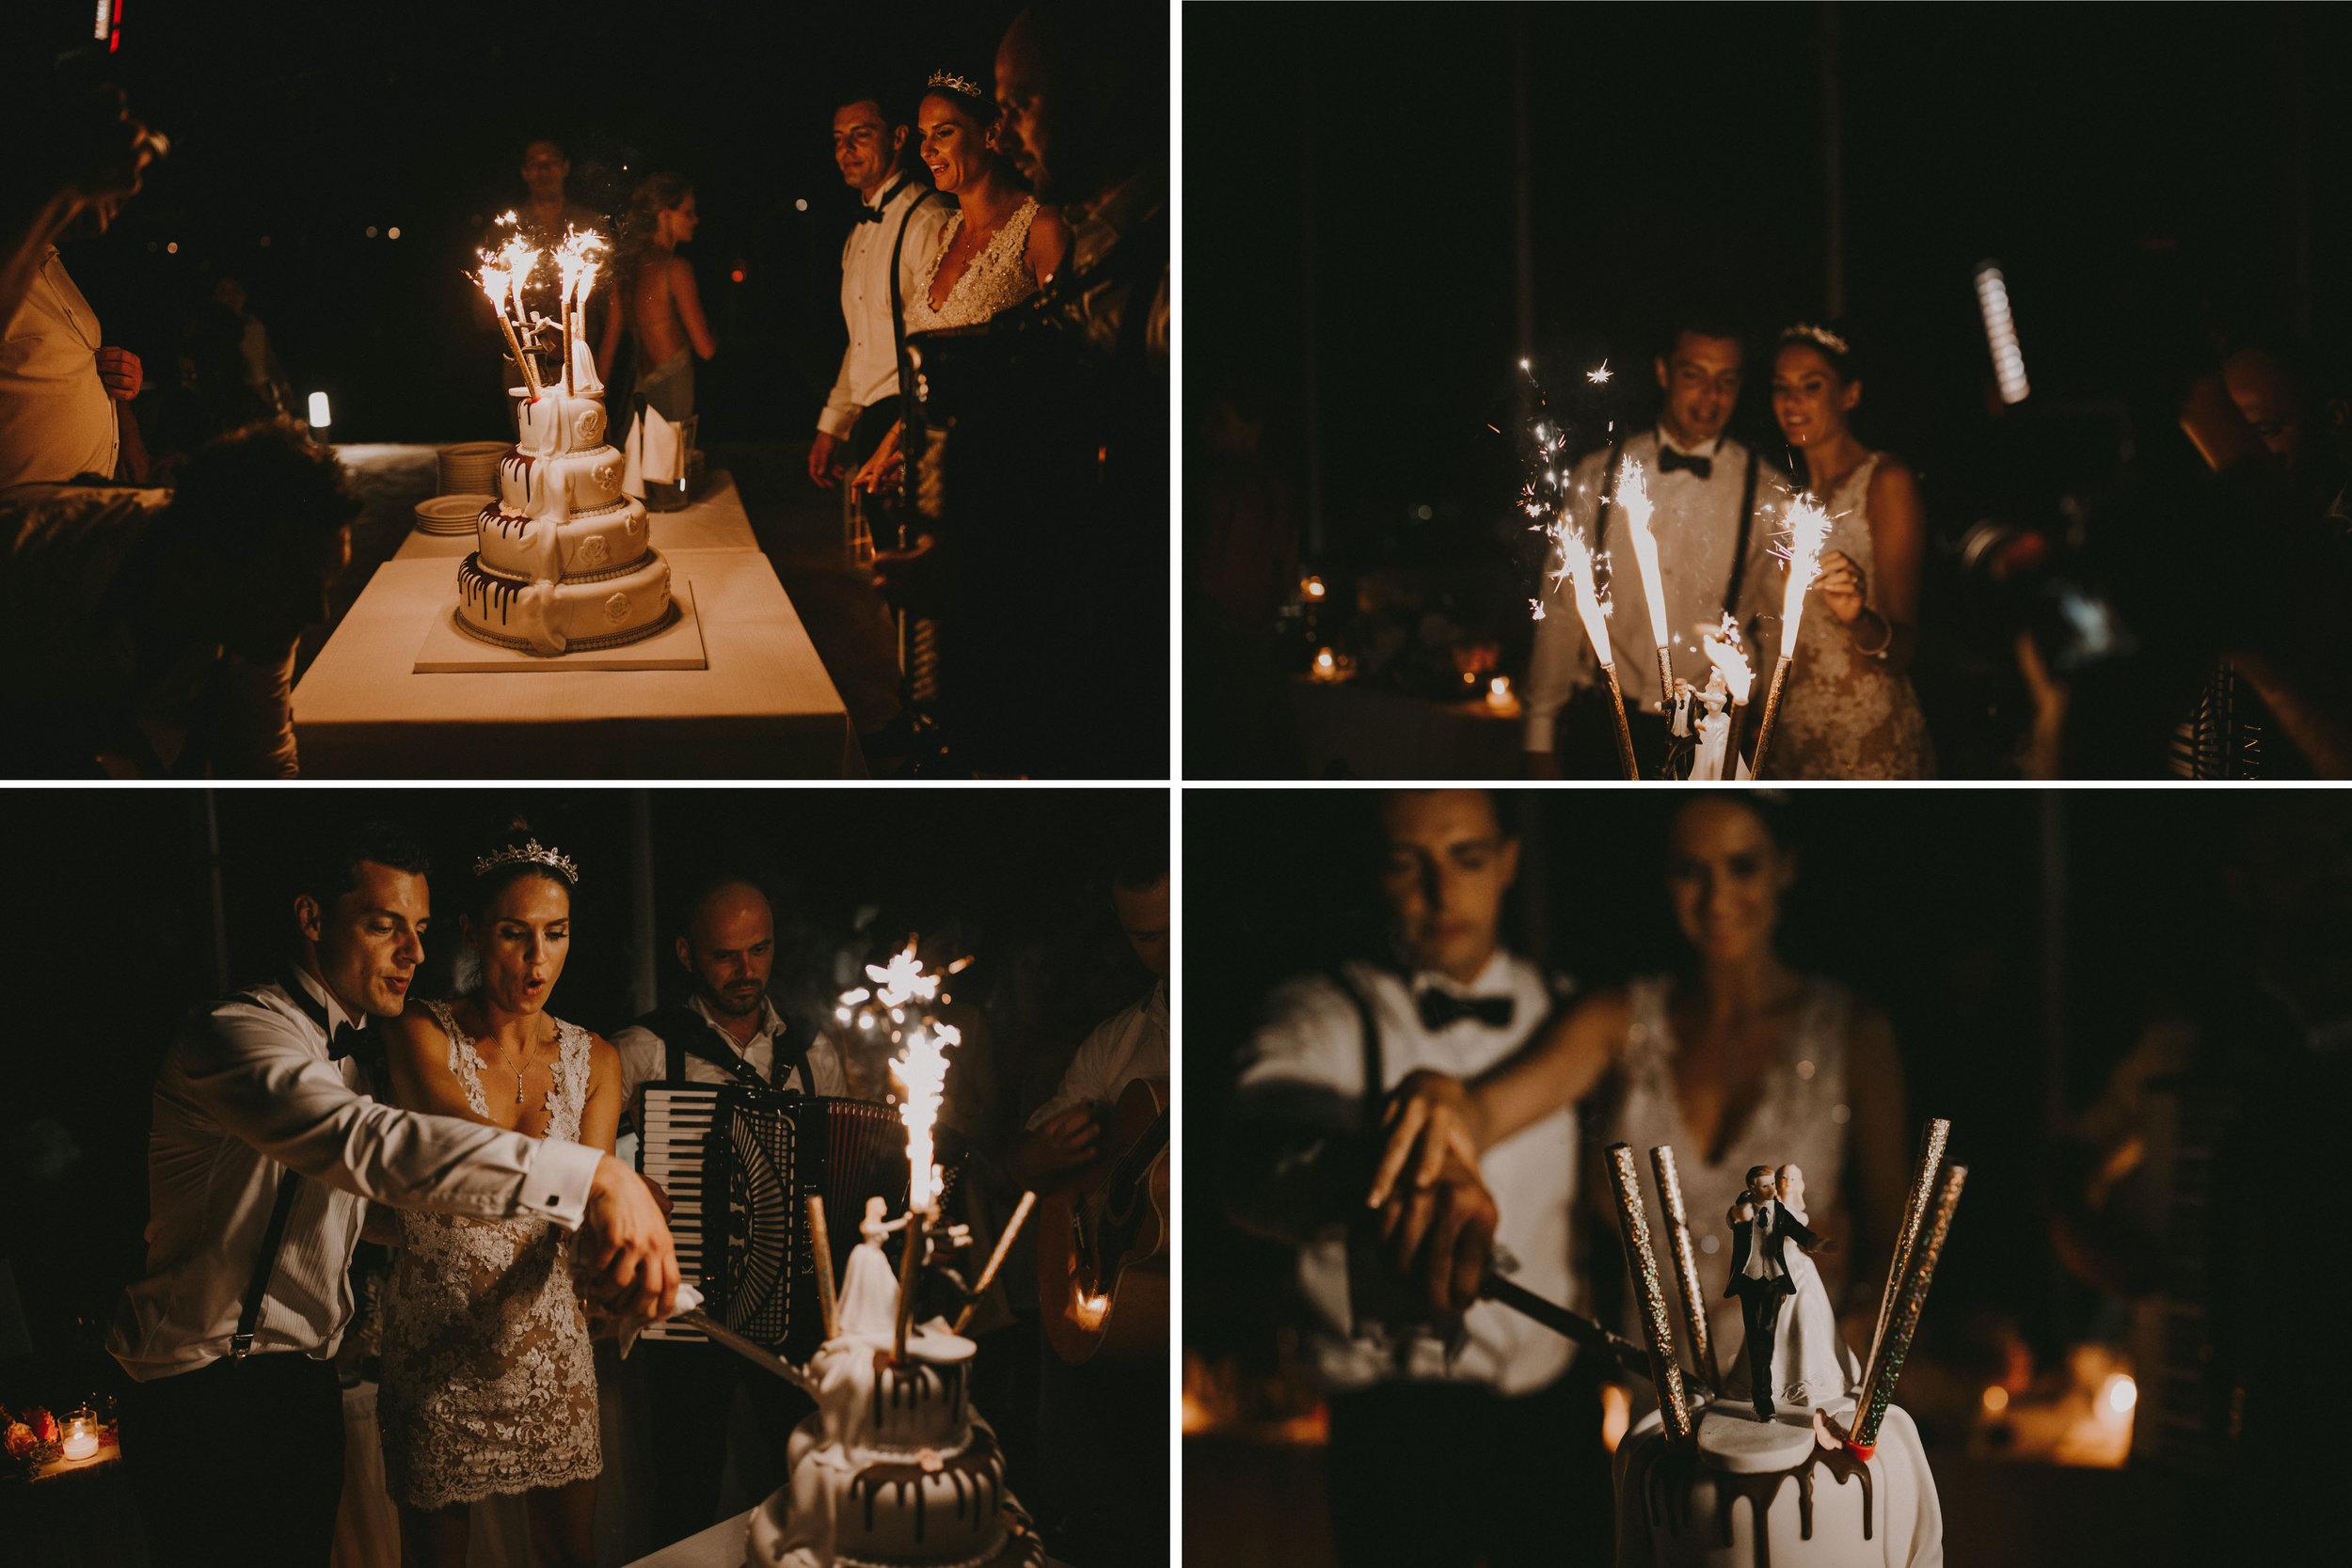 sylvia&dimitri-Wedding-Crvena_Luka-Croatia-124(0482)2.jpg